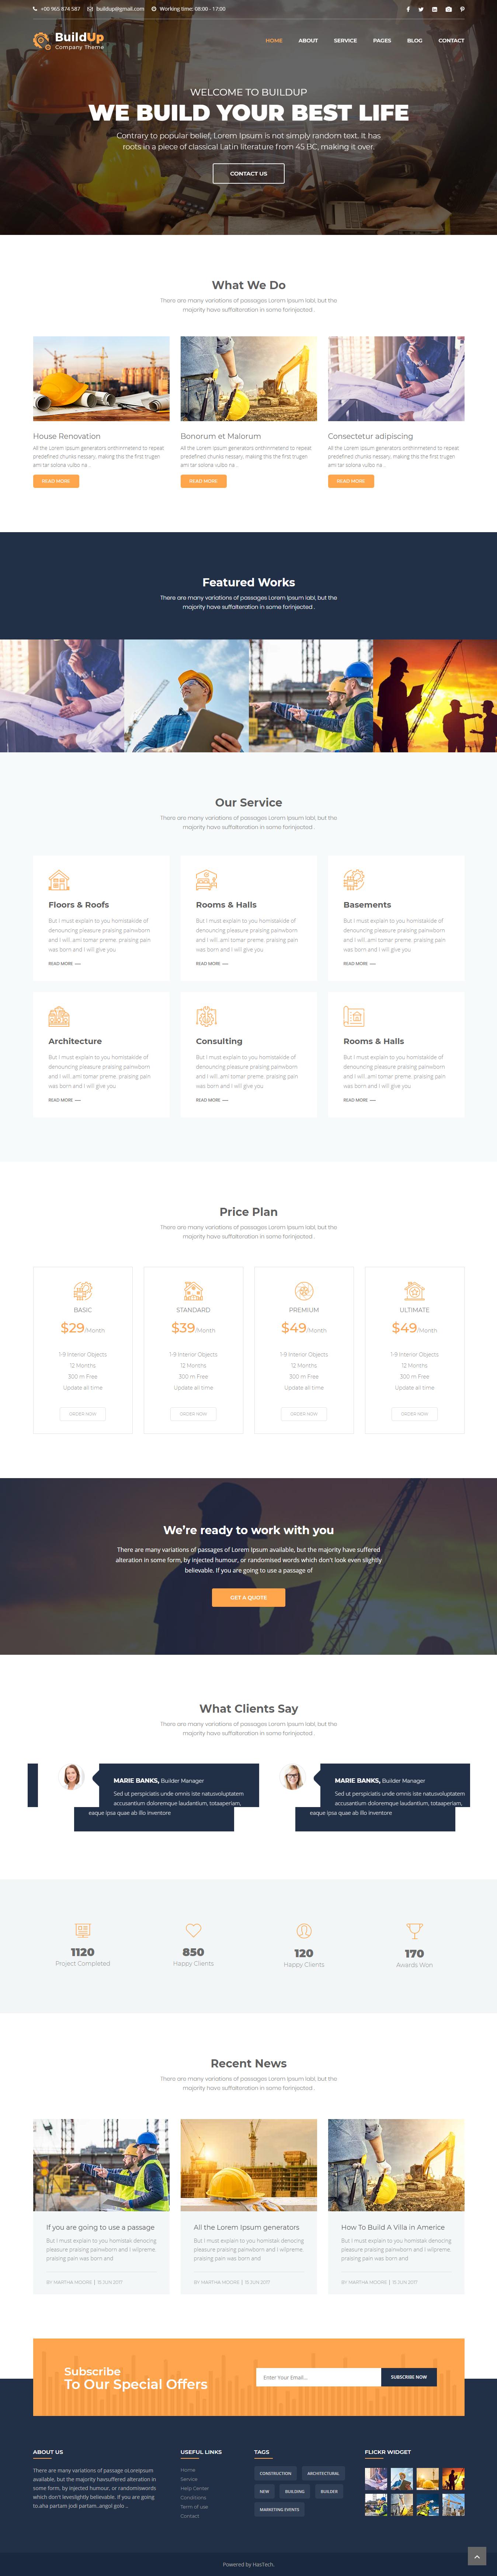 Buildup html